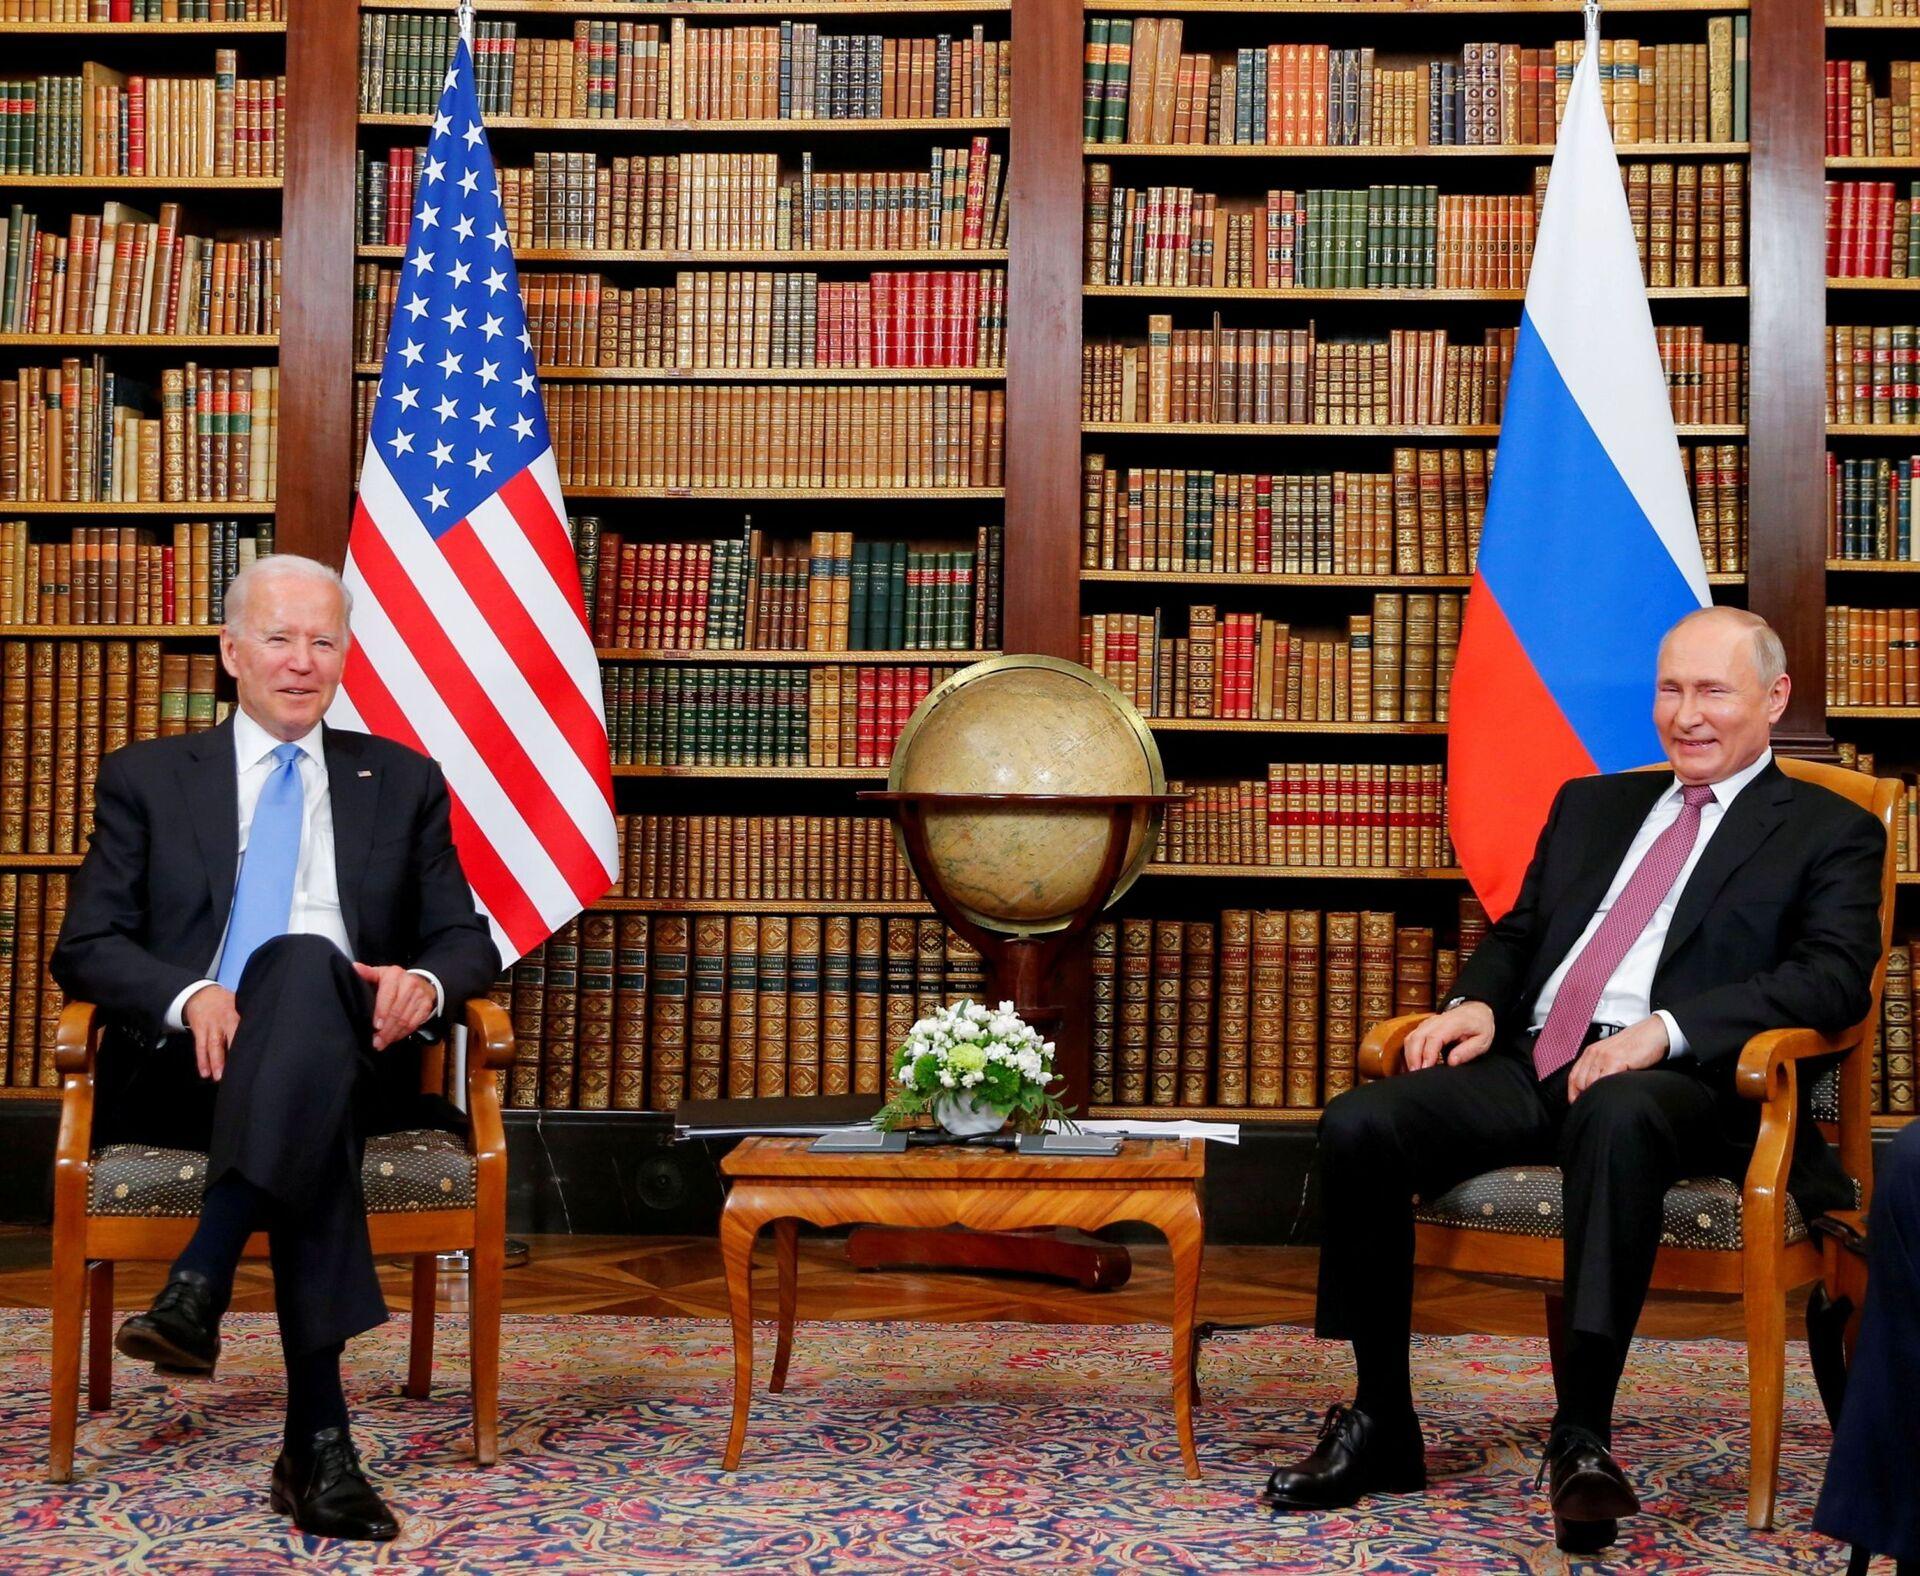 U.S. President Joe Biden and Russia's President Vladimir Putin meet for the U.S.-Russia summit at Villa La Grange in Geneva, Switzerland, June 16, 2021. - Sputnik International, 1920, 07.09.2021